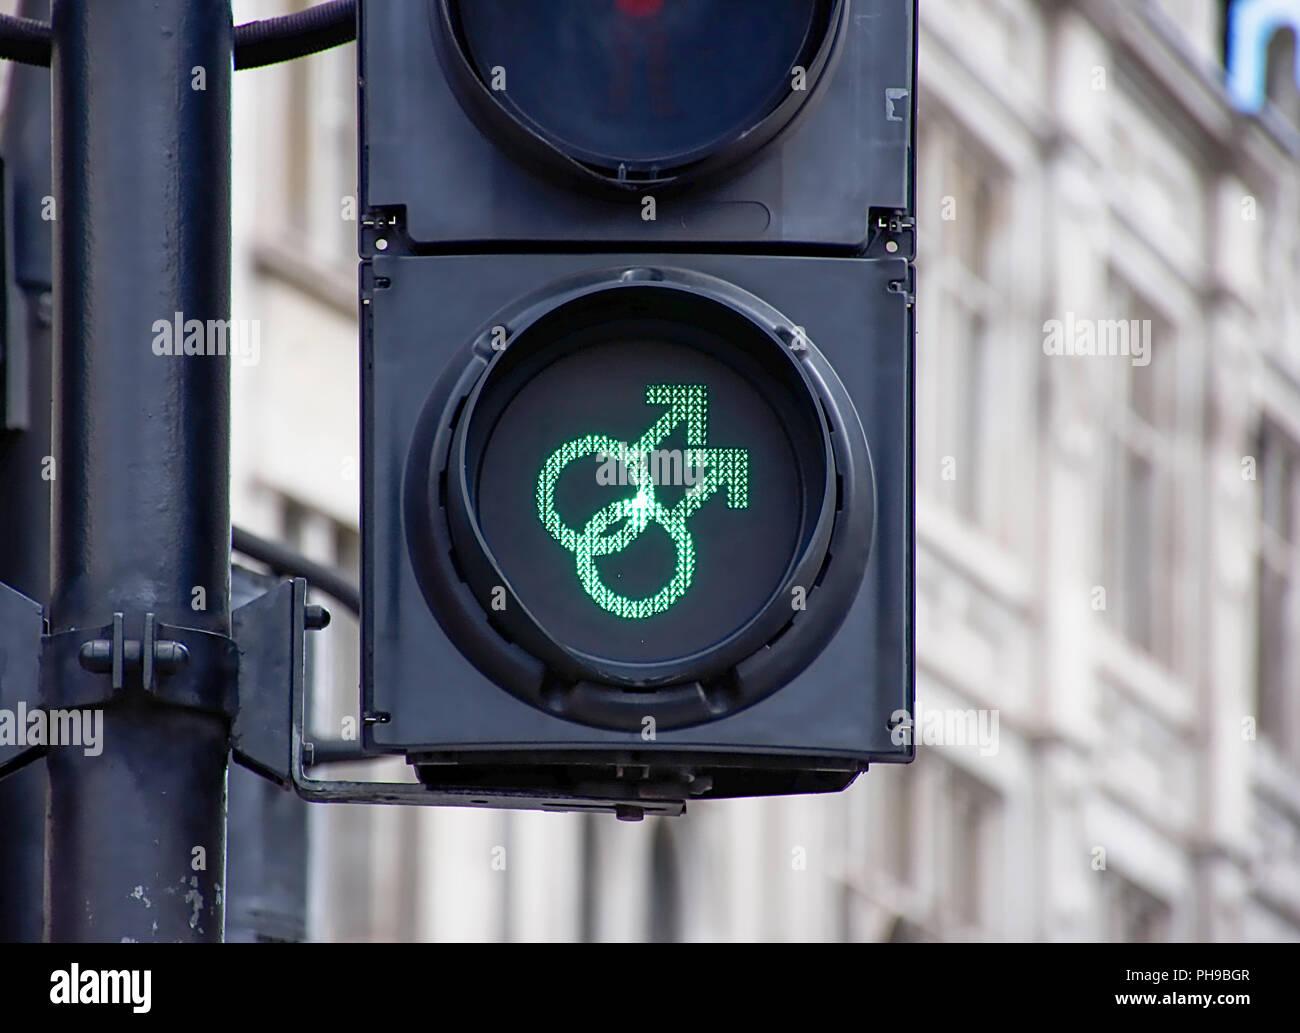 Trafalgar square,London/Uk-08.06.2017.Equality traffic lights on pedestrian crossing marking anniversary of  decriminalization of homosexuality.LGBTQ. - Stock Image